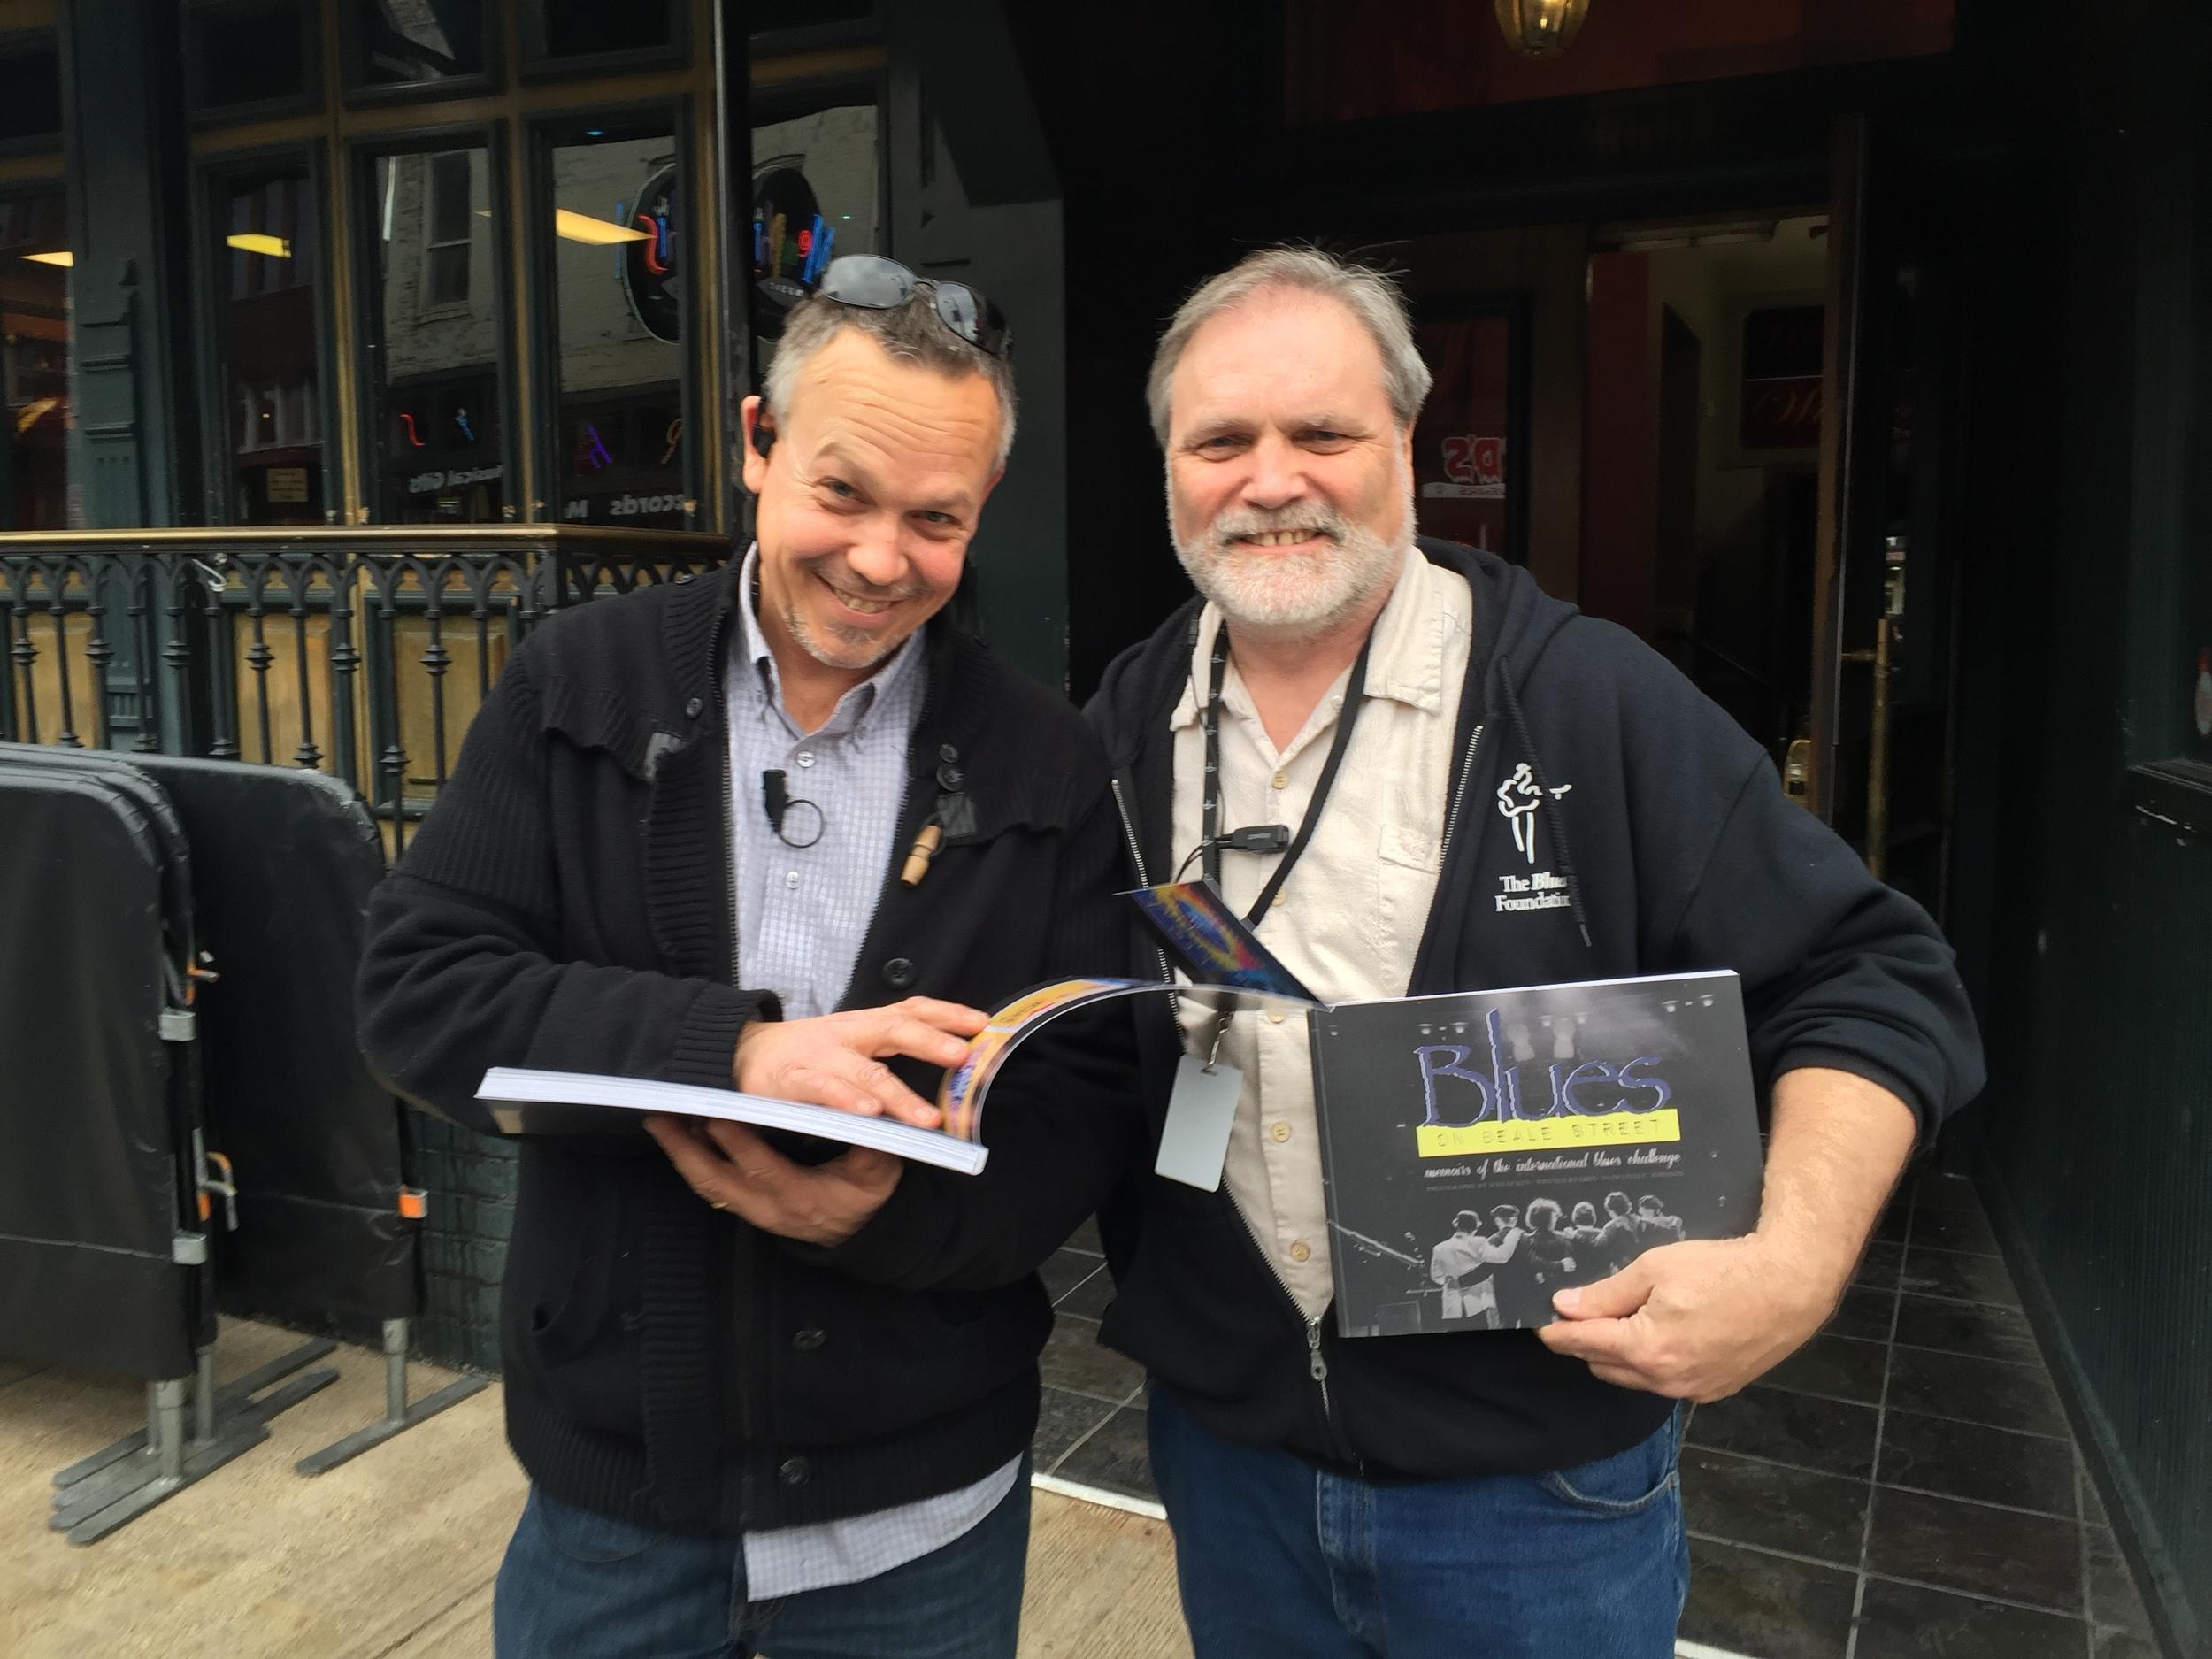 Joe Whitmer and Greg